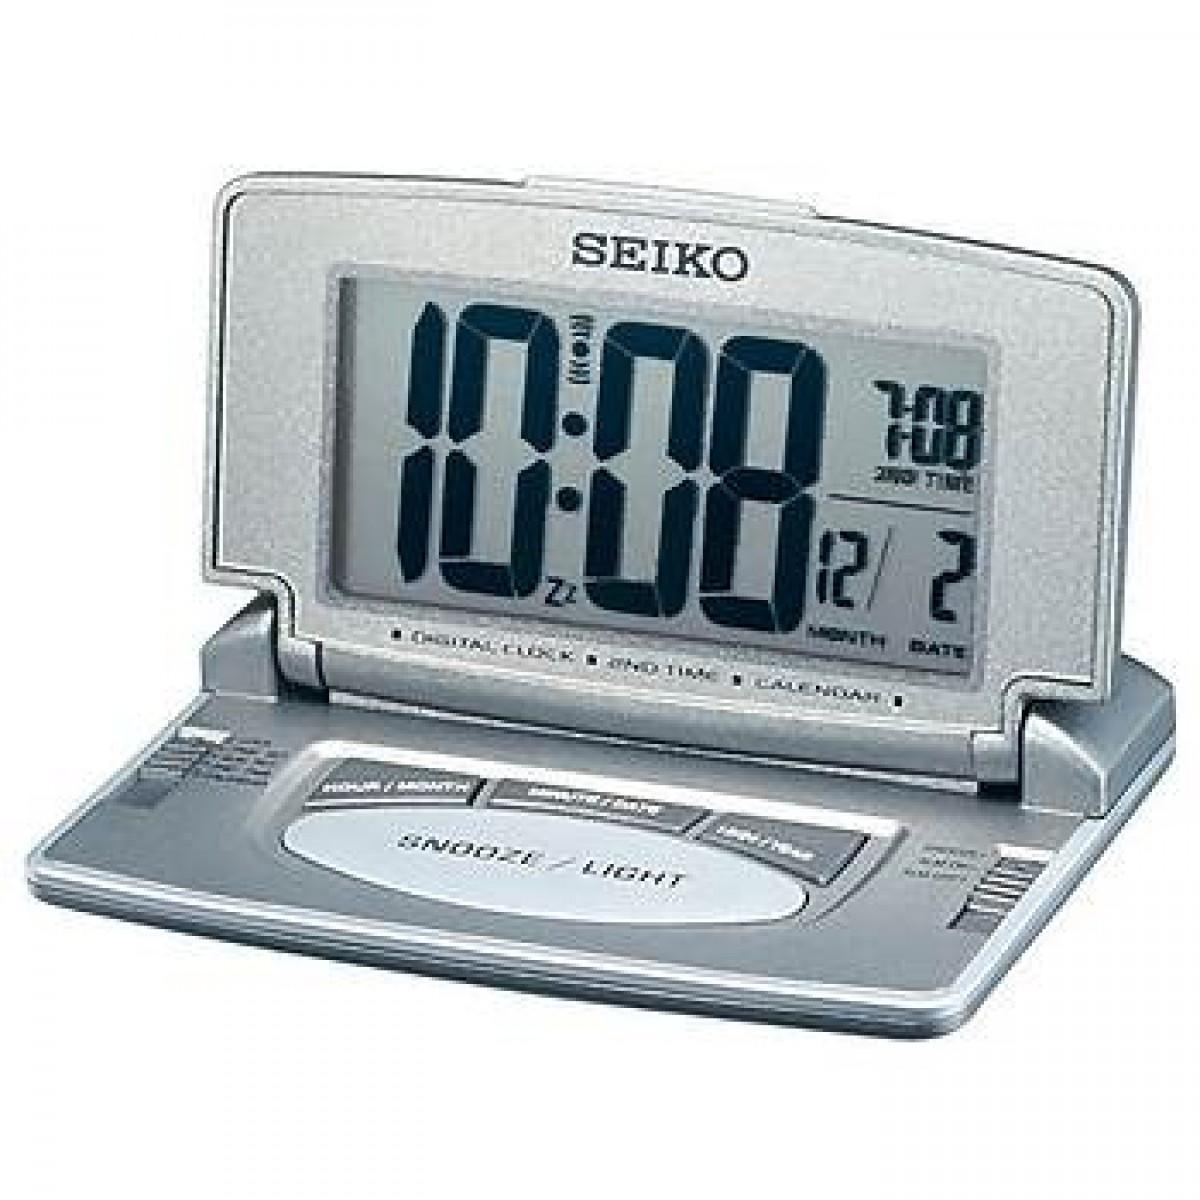 Seiko LCD Travel & Desk Alarm Clock with Dual Time Calendar Grey Silver QHL021N